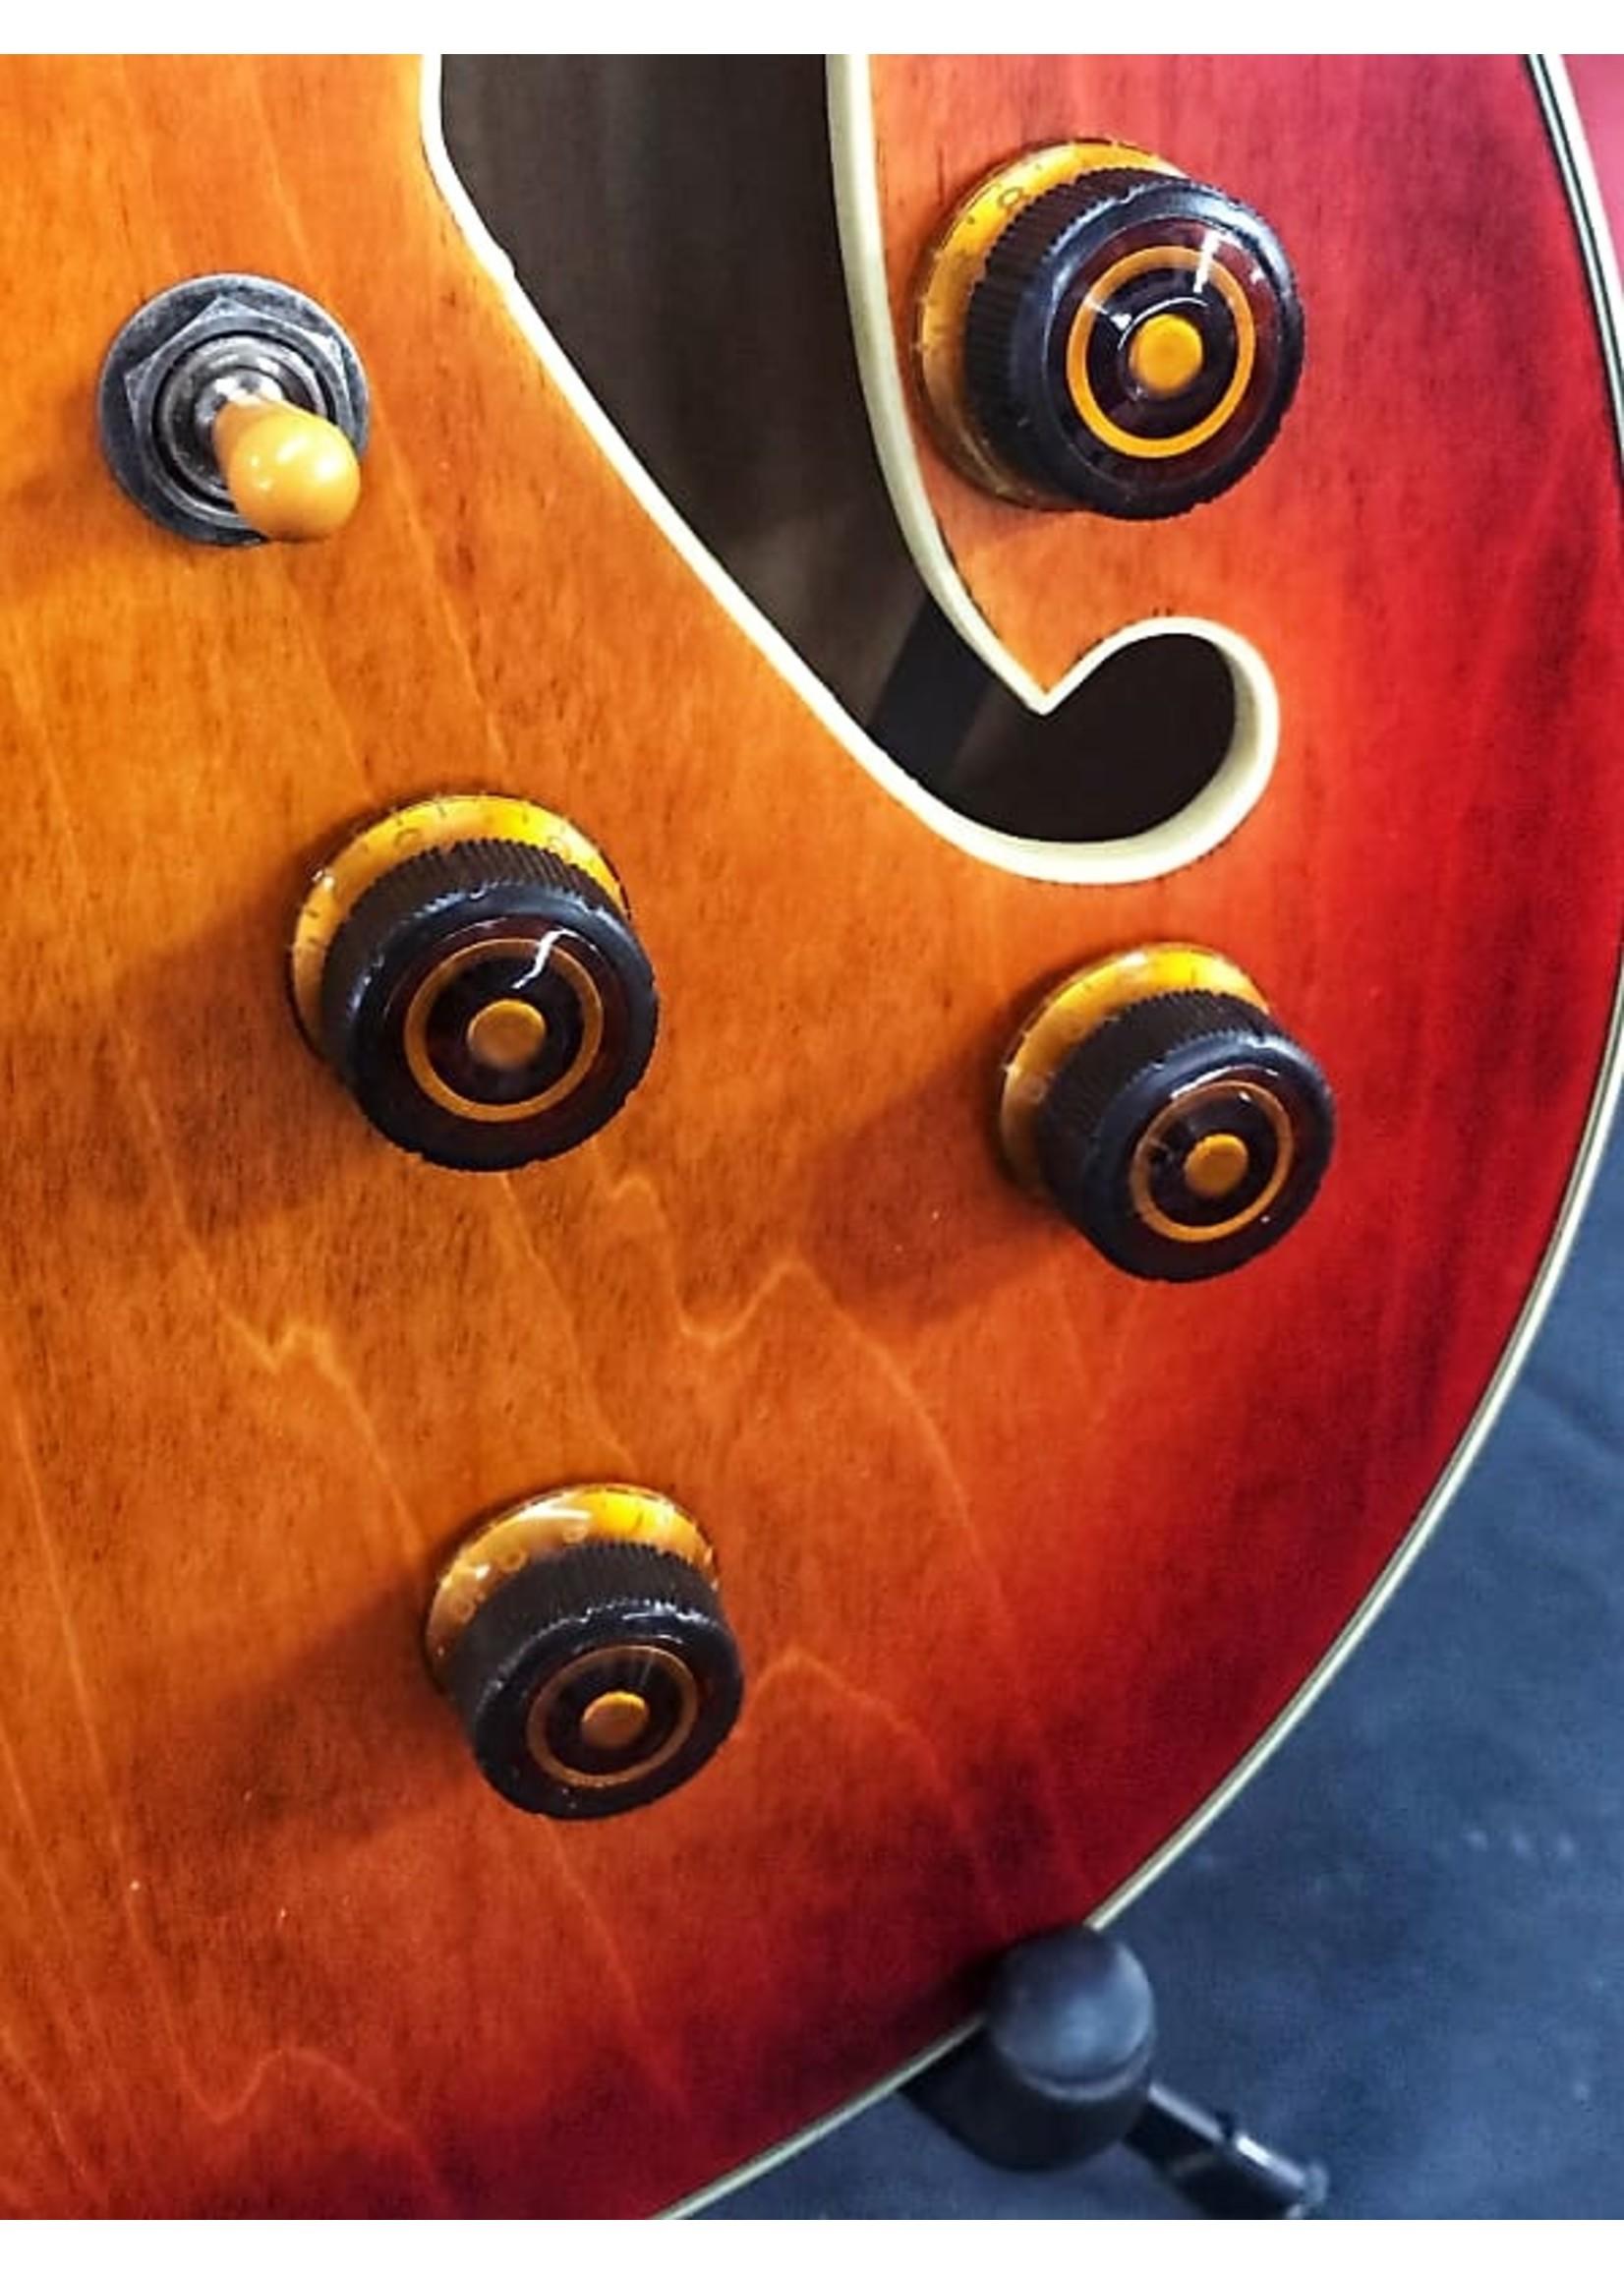 Ibanez Ibanez ASV73-VAL Vintage Amber Burst Low Gloss